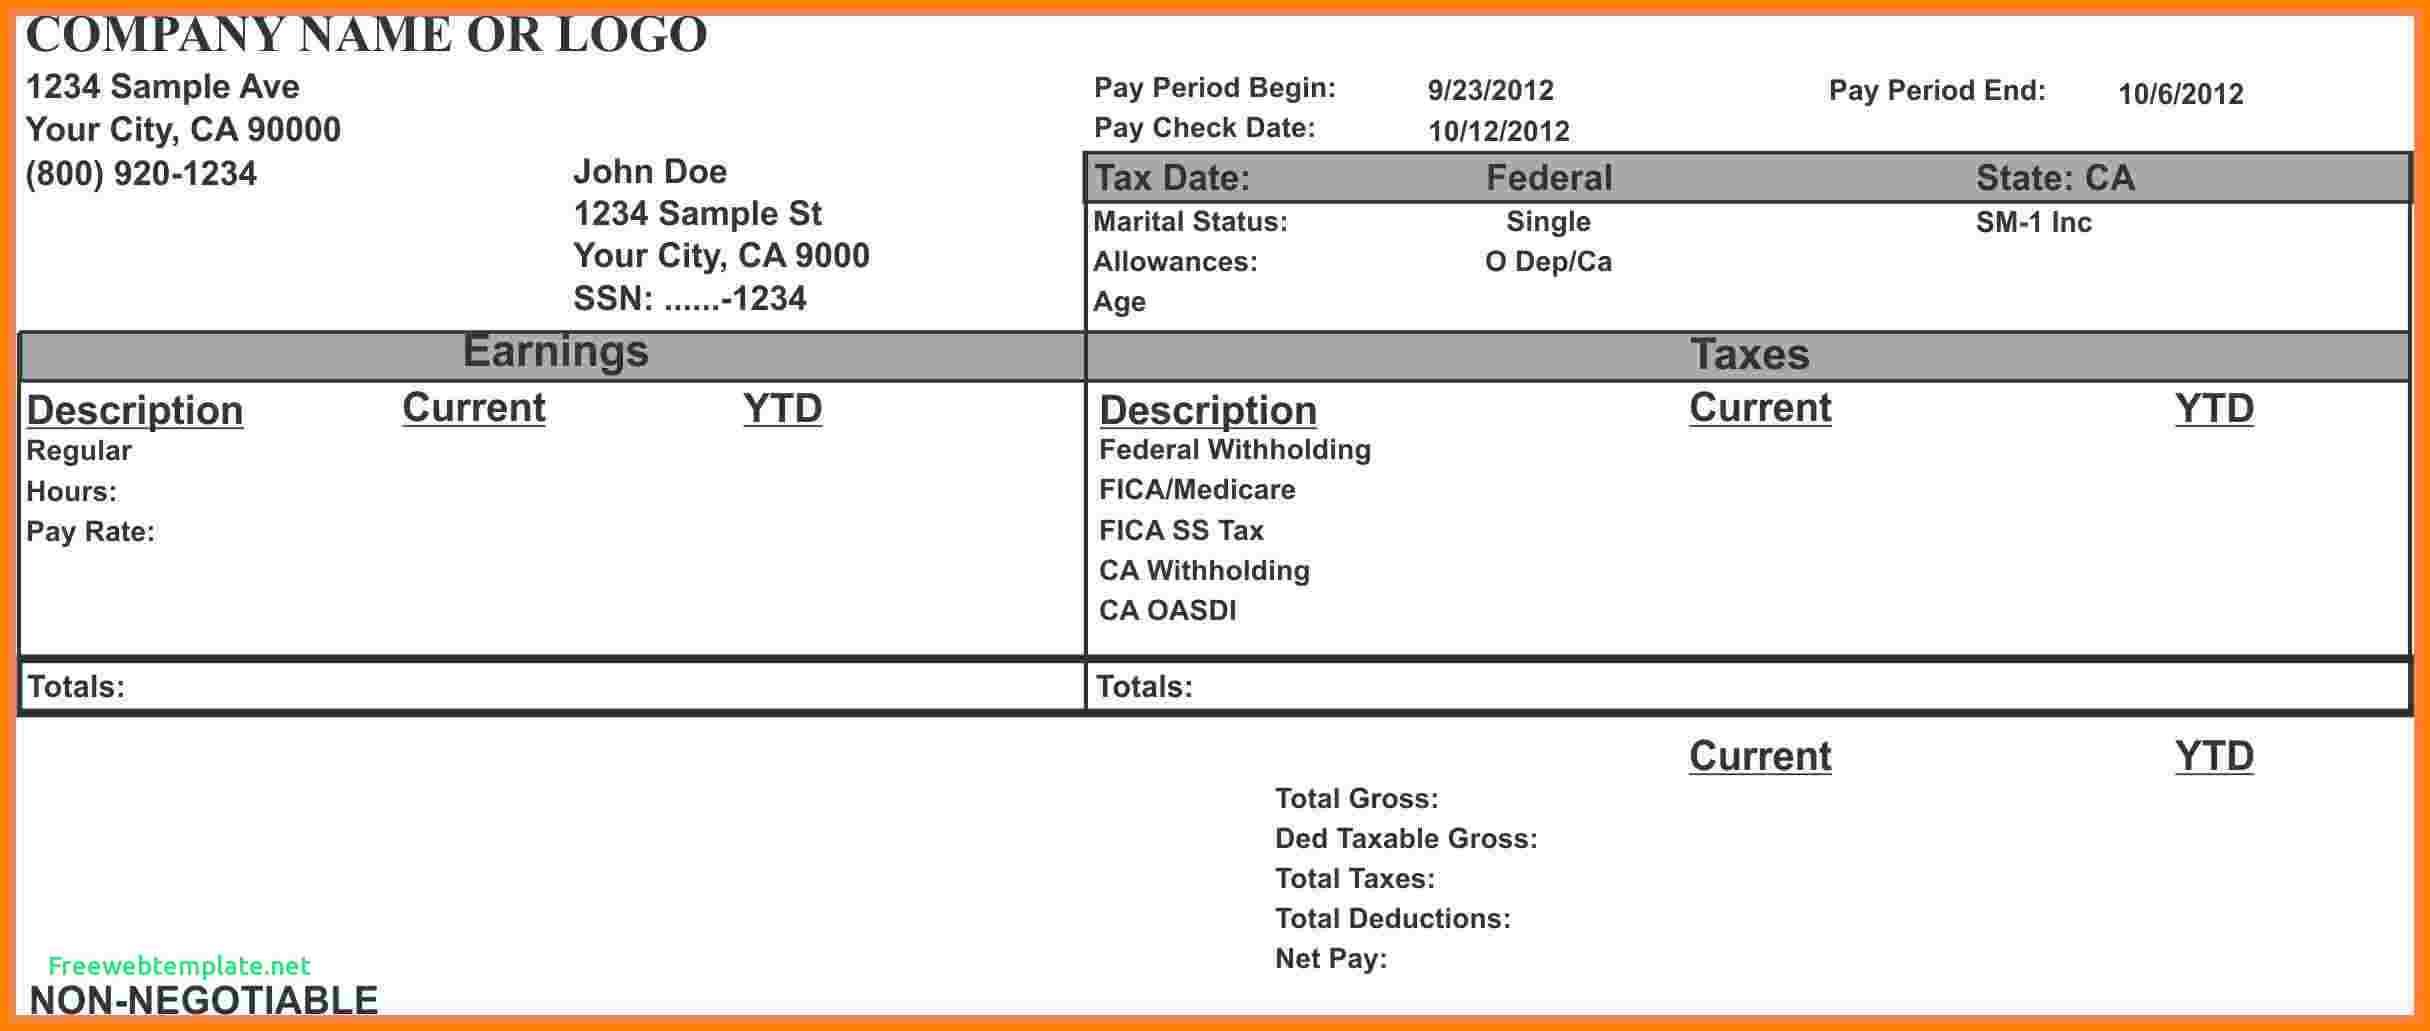 Blank Pay Stub Template Word Fresh 10 1099 Pay Stub Template